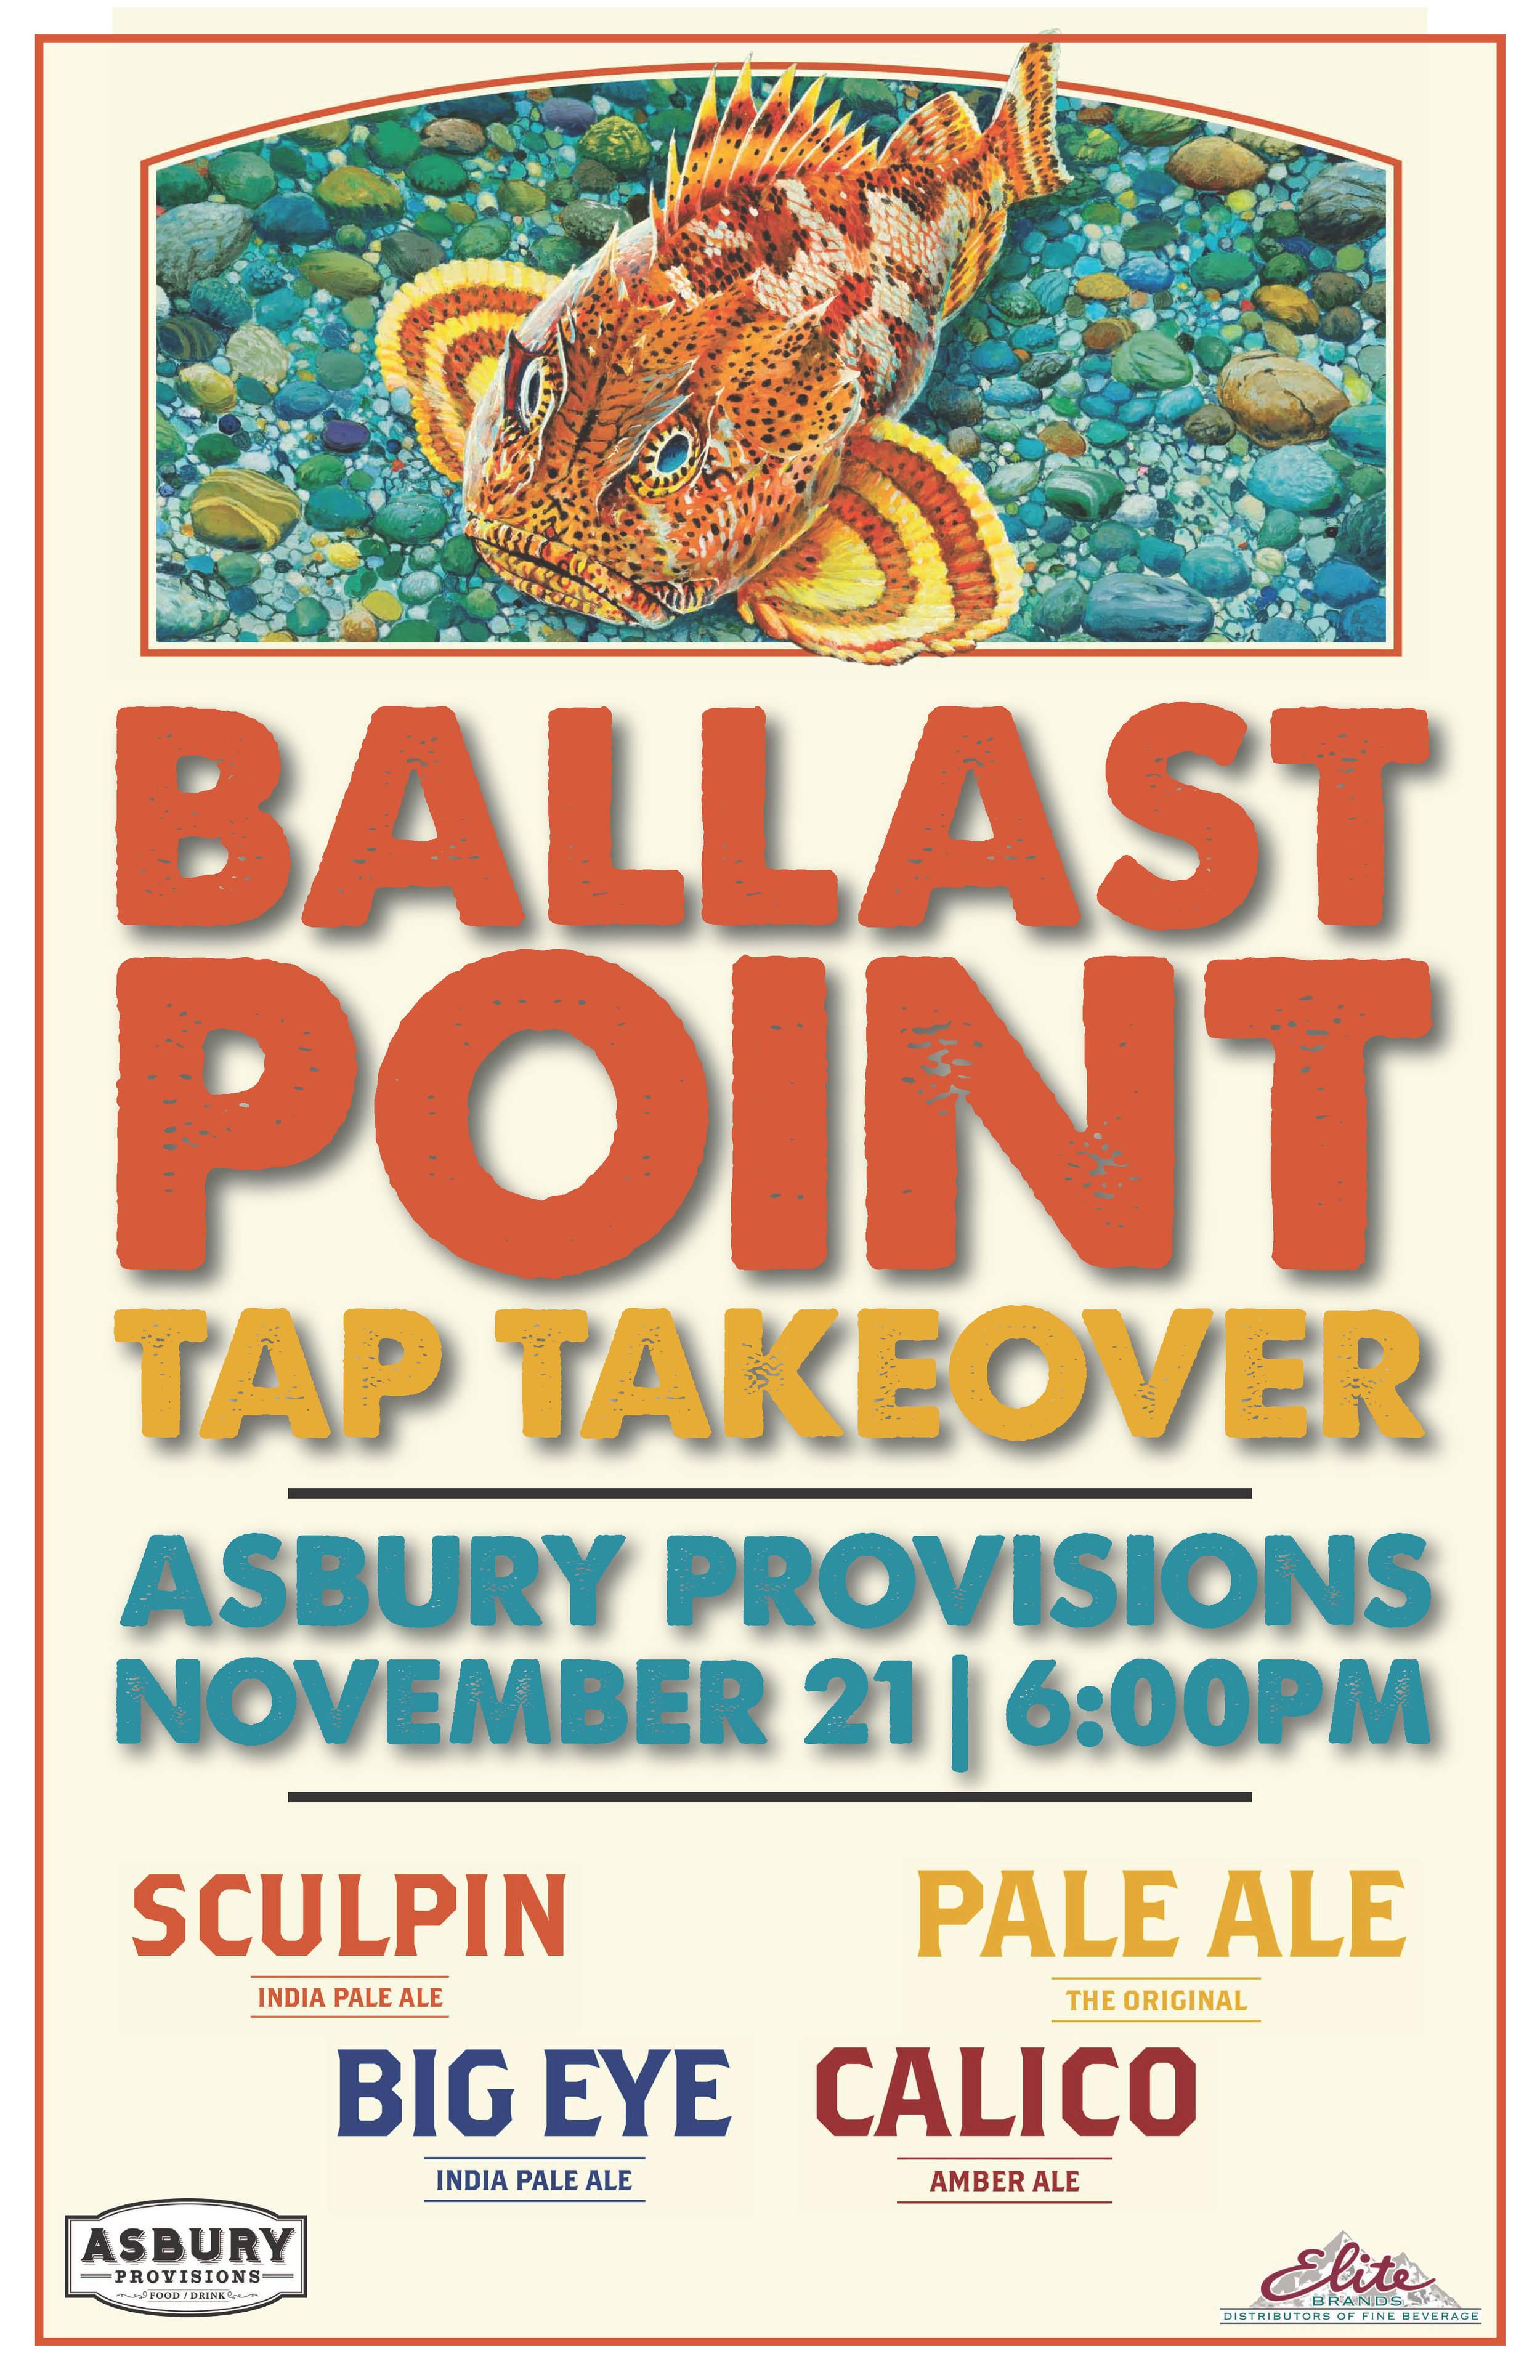 asbury-provisions-ballast-point.jpg